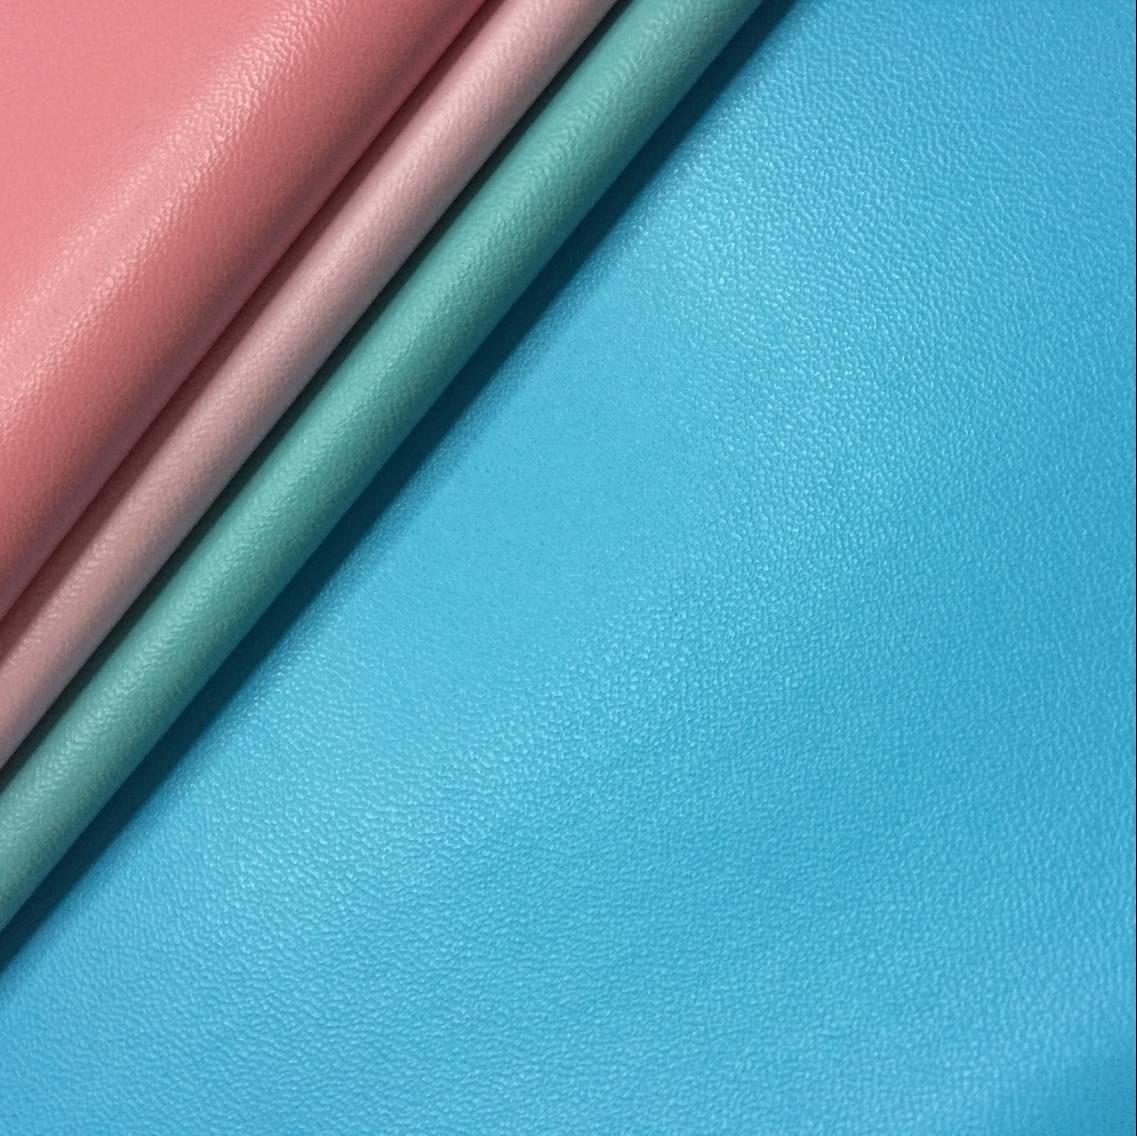 0.75mmpu imitation sheepskin with cashmere bottom for bags and handbags0.75mmpu imitation sheepskin